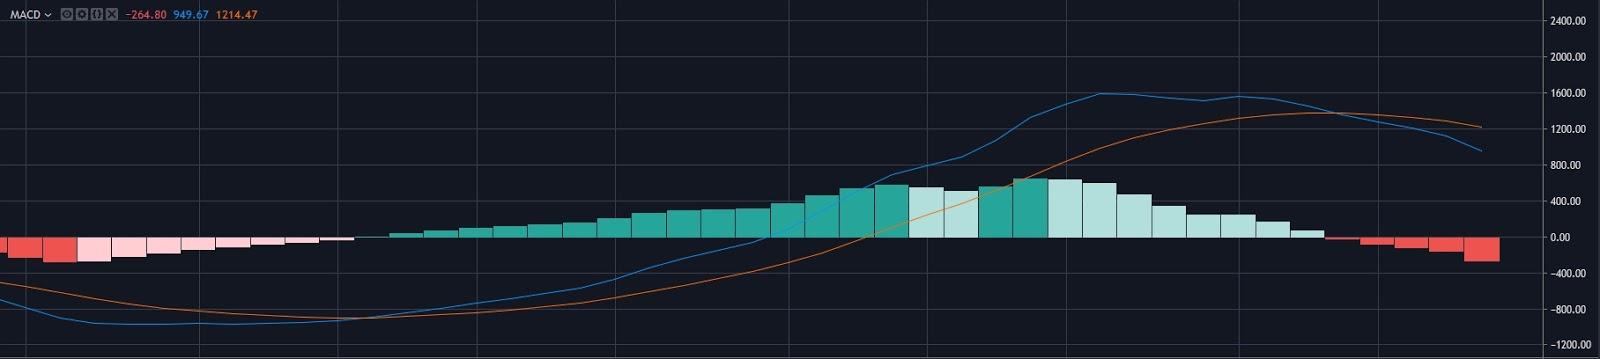 BTC USD 1 Week MACD